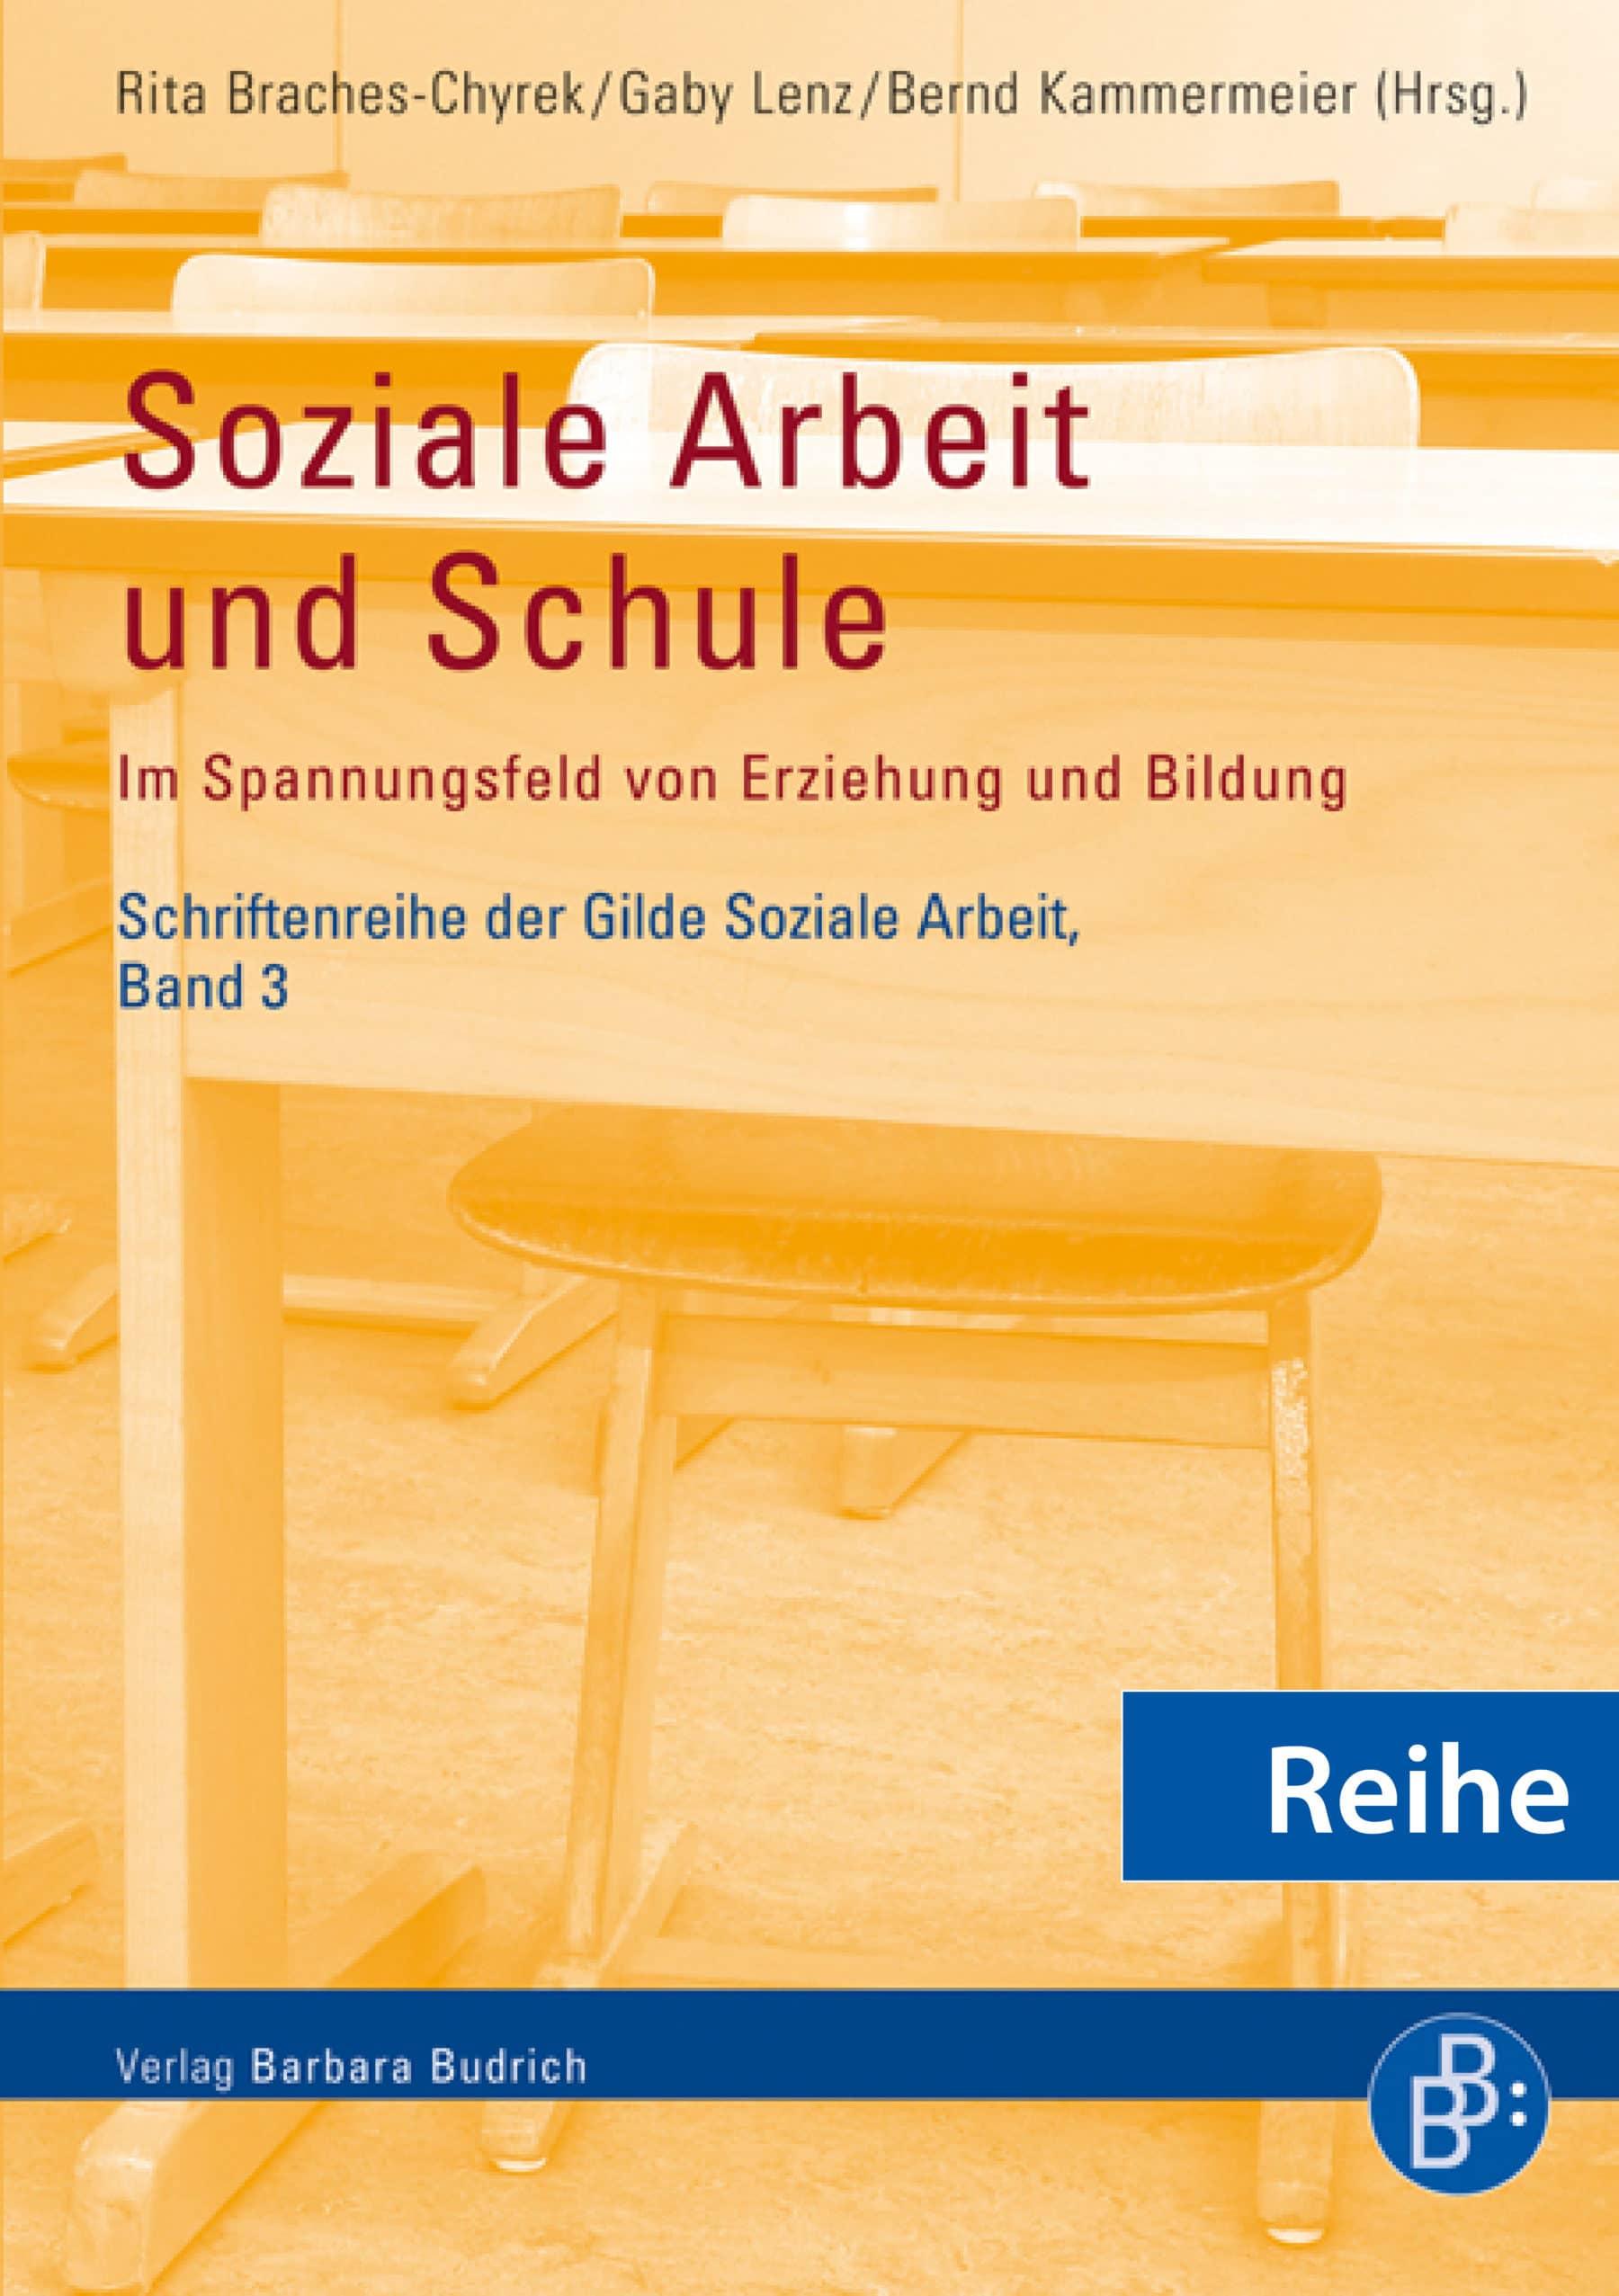 Reihe – Schriftenreihe der Gilde Soziale Arbeit e.V.